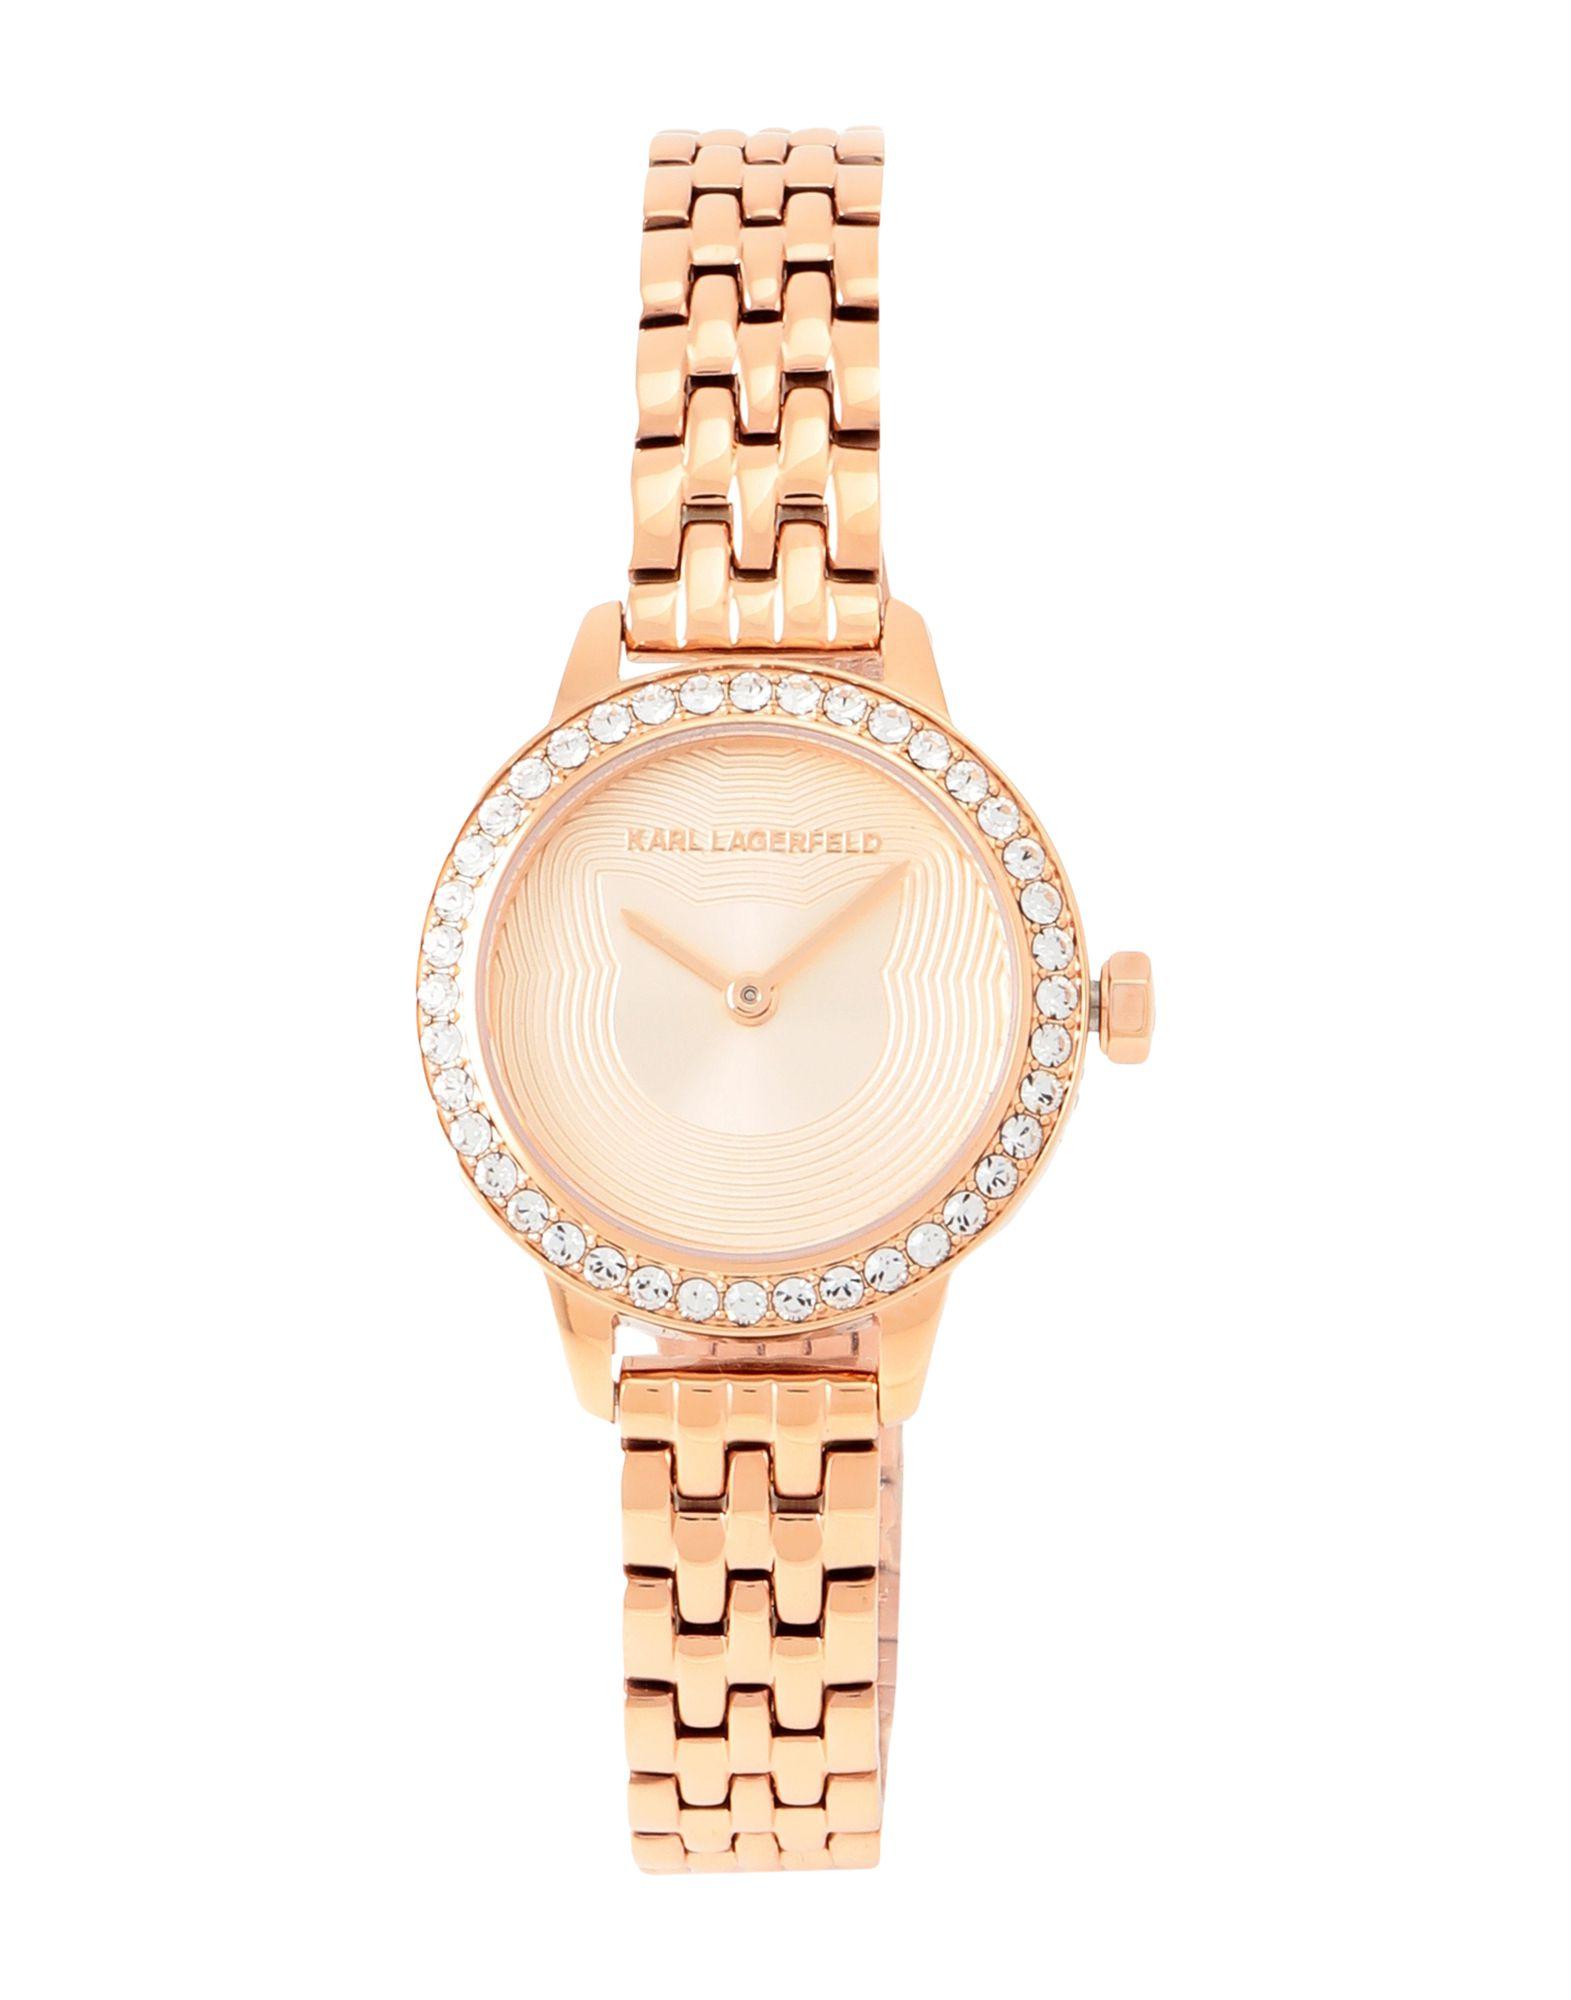 KARL LAGERFELD Wrist watches - Item 58050405